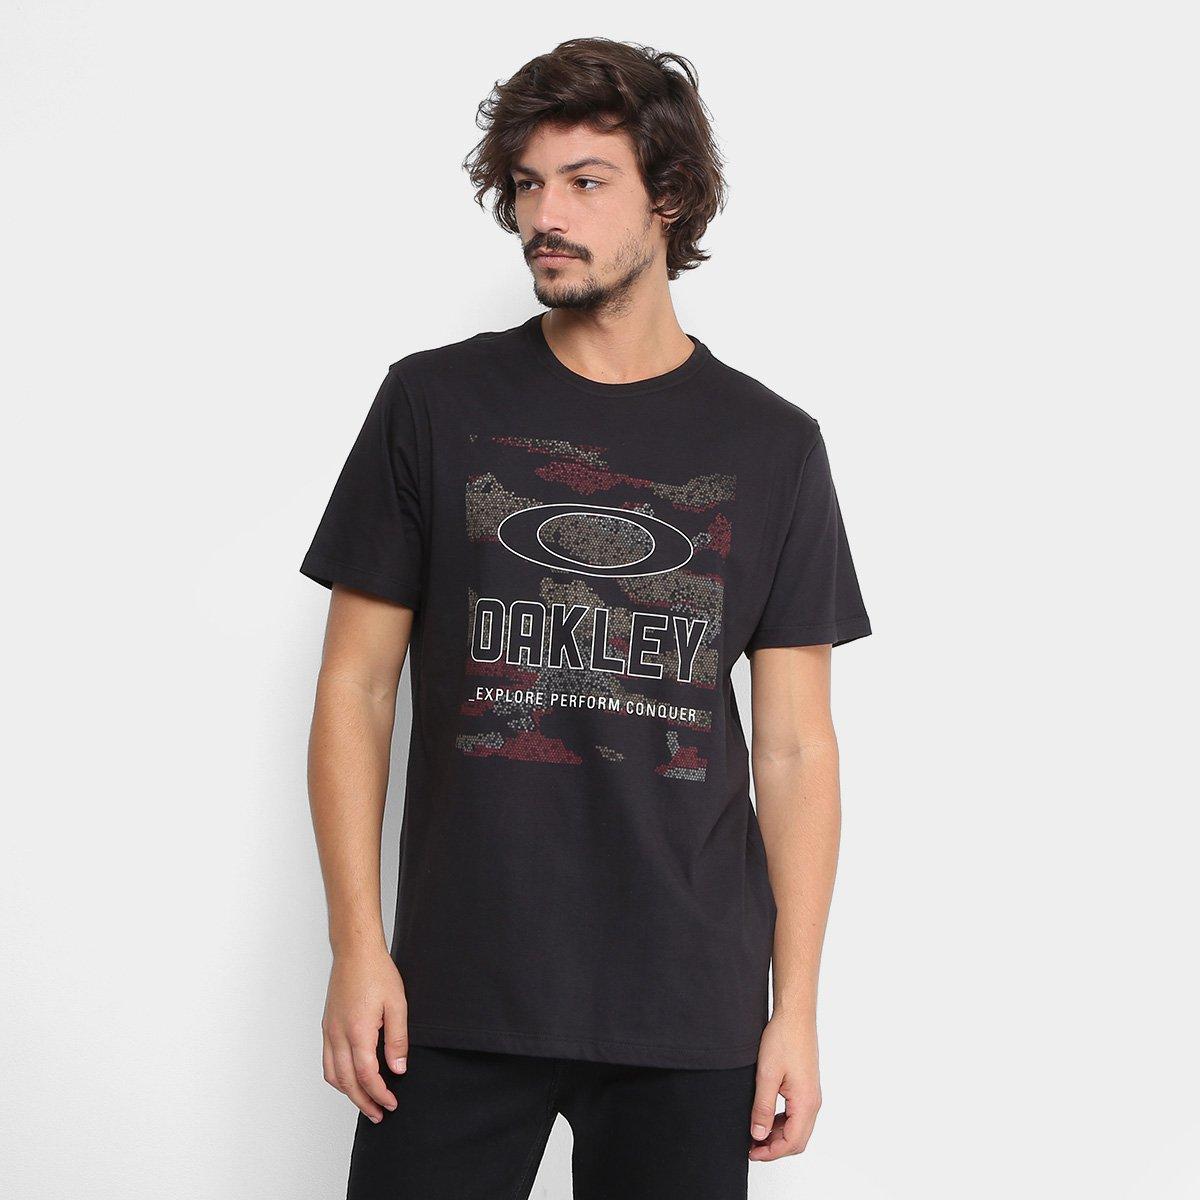 9effb5e774 Camiseta Oakley Hive Camo Tee Masculina - Preto - Compre Agora ...